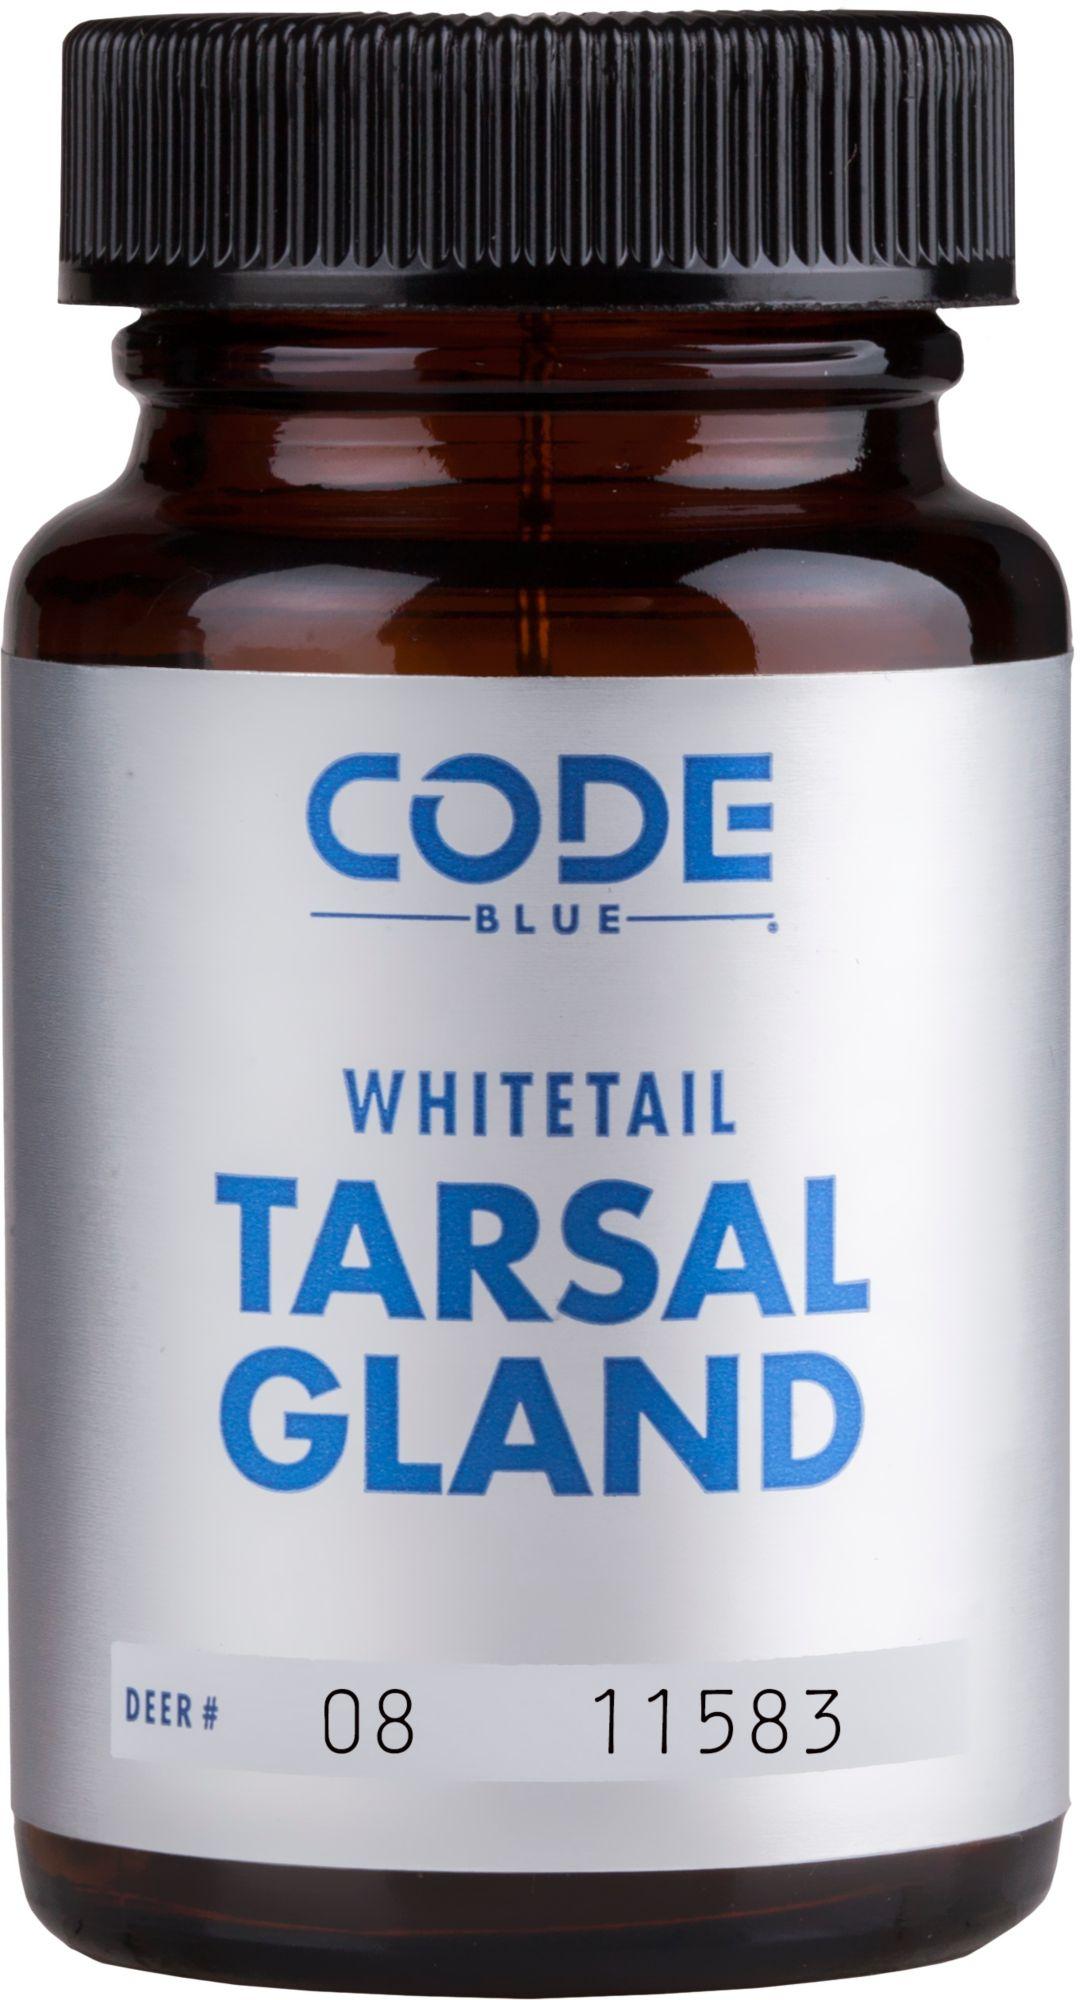 Code Blue Whitetail Tarsal Gland Deer Attractant thumbnail